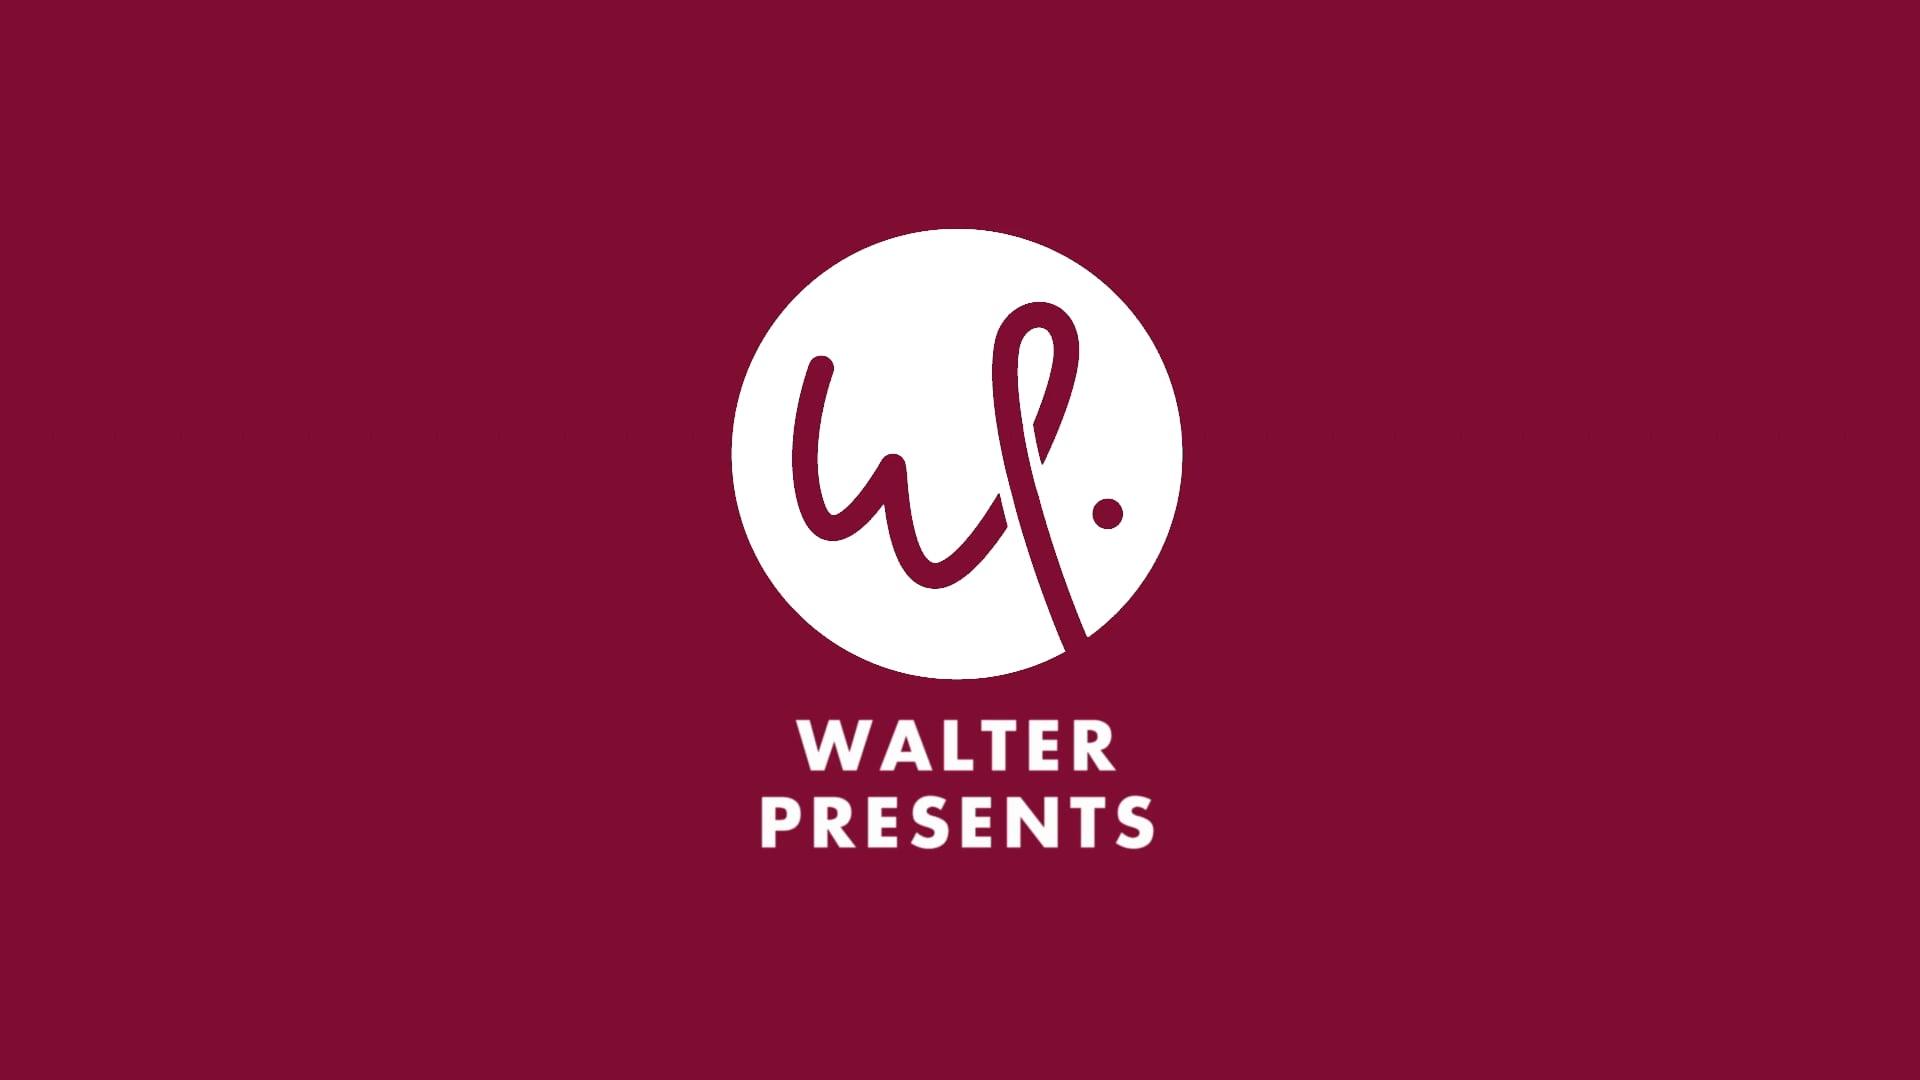 Walter Presents US Reel